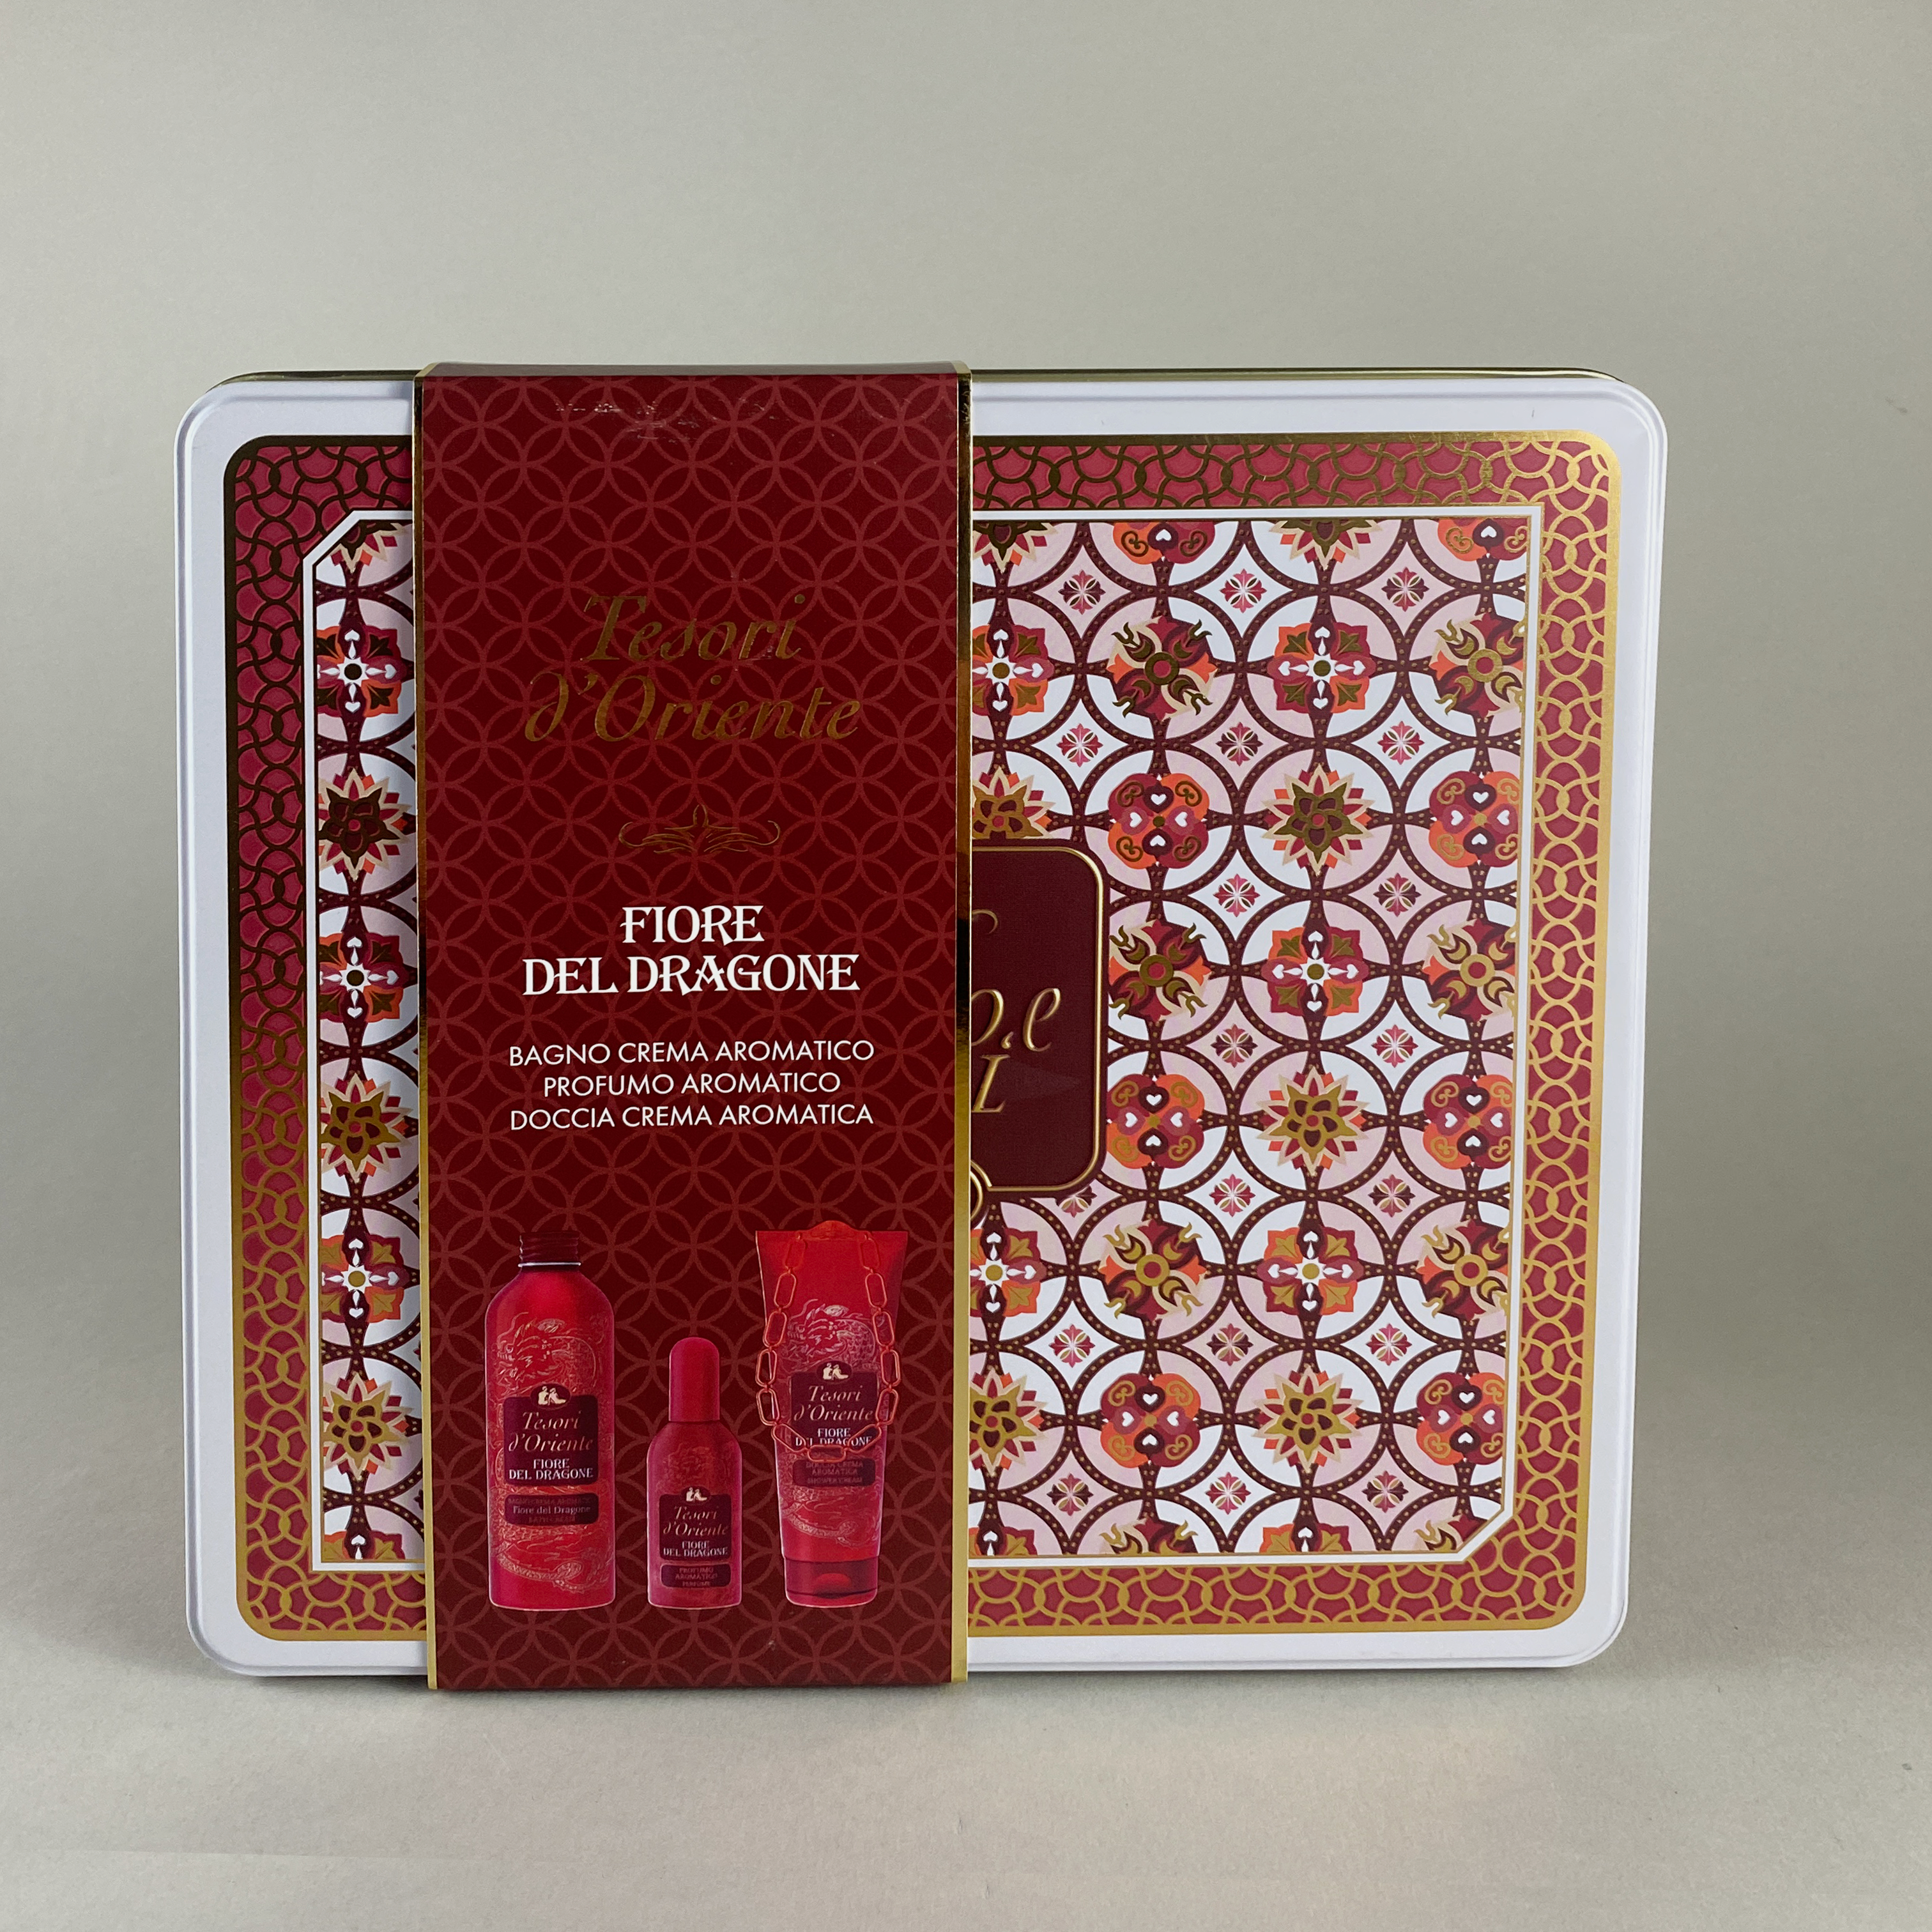 Tesori подарочный набор Fiore del Dragone